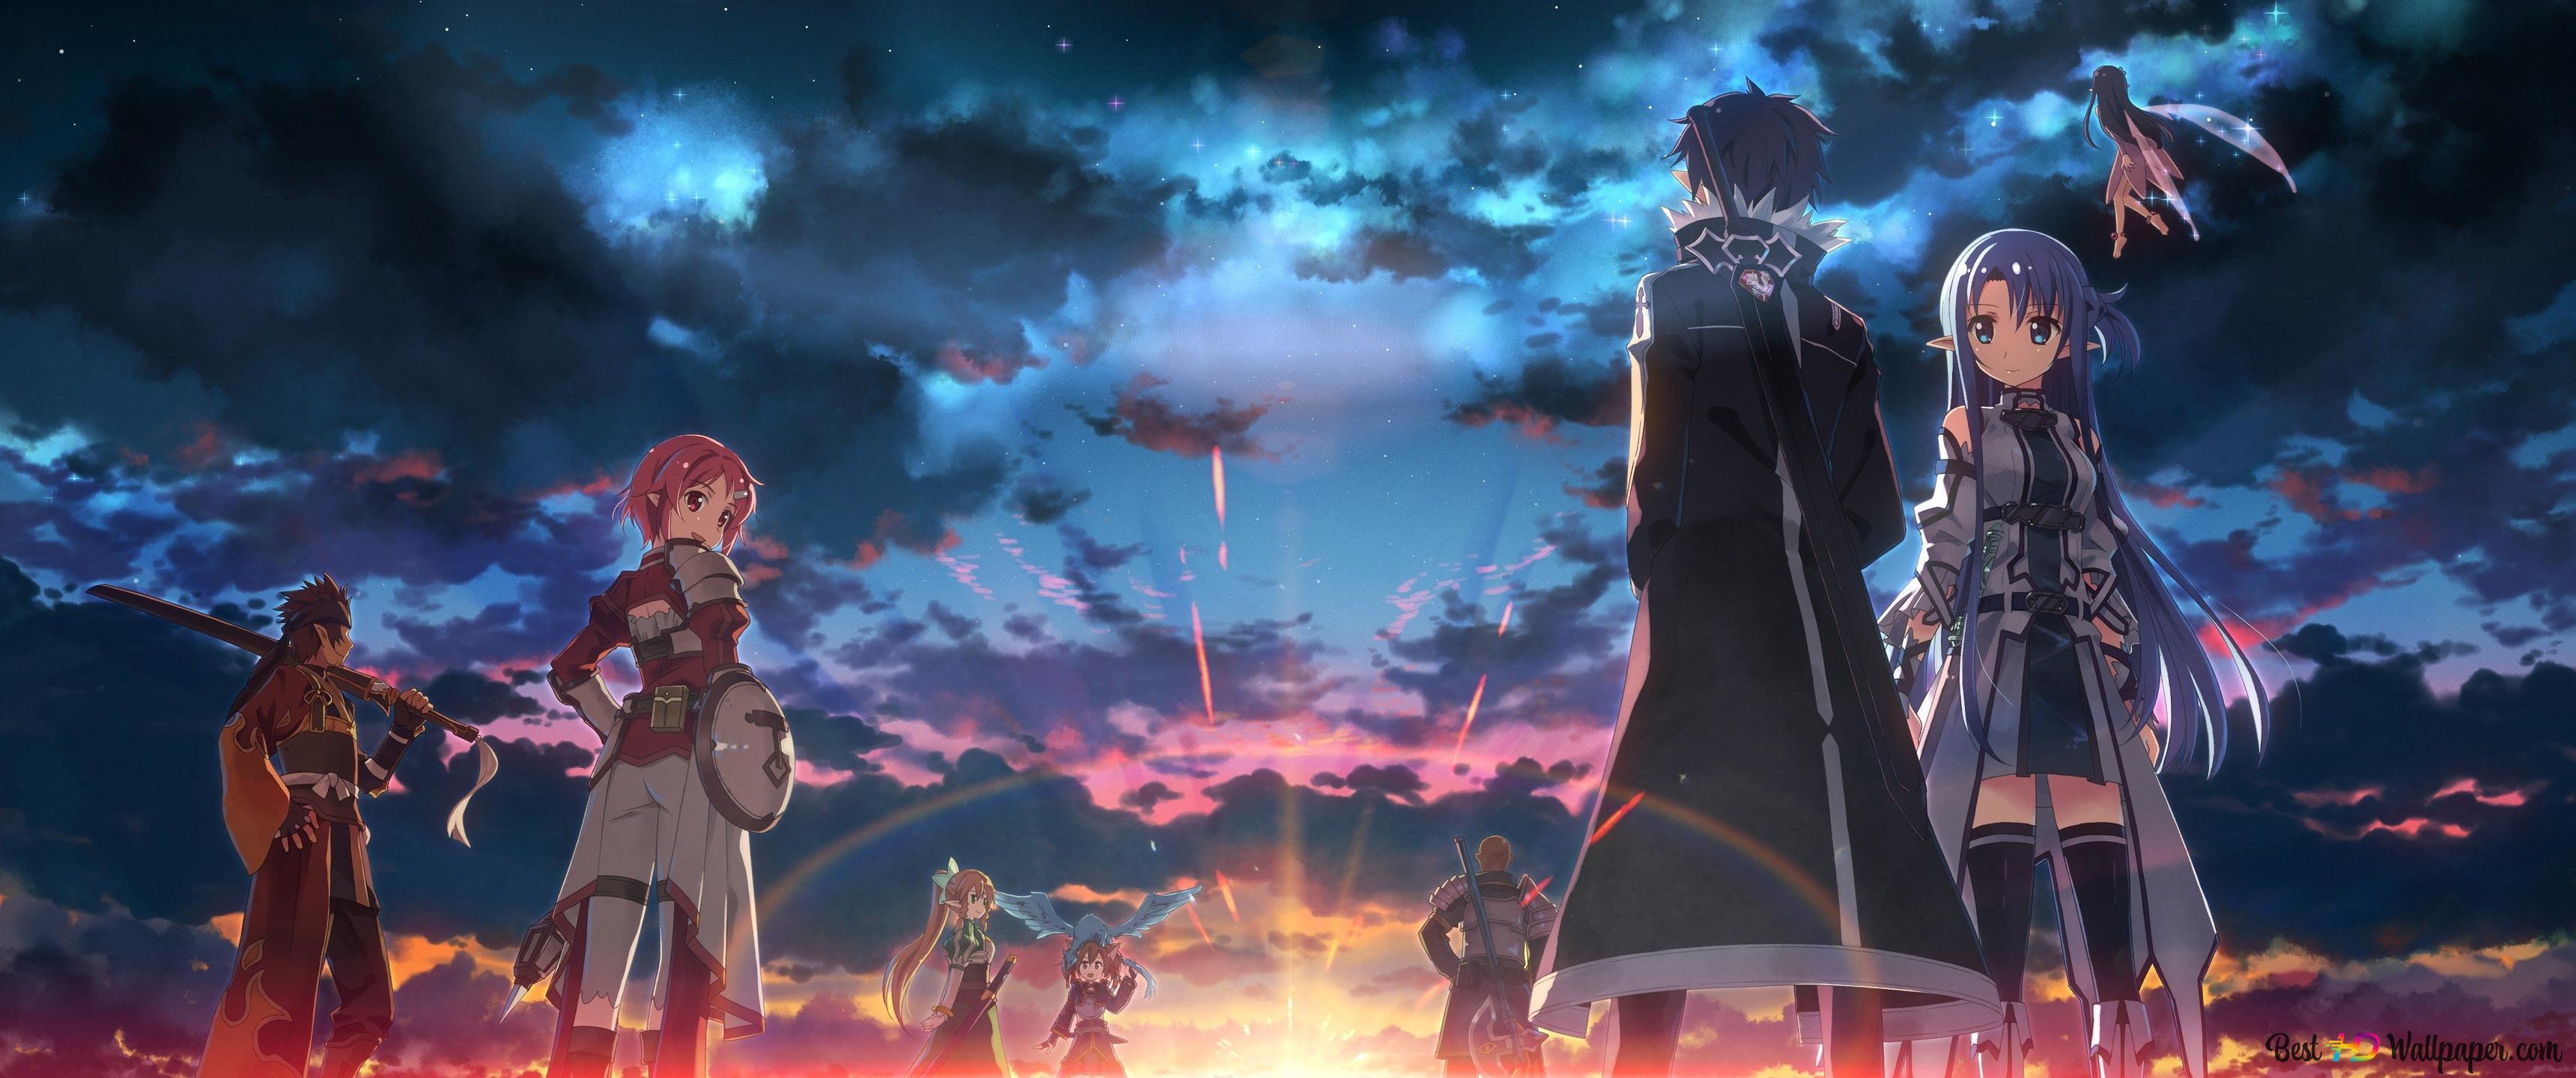 Sword Art Online Fatal Bullet Anime Video Game Hd Wallpaper